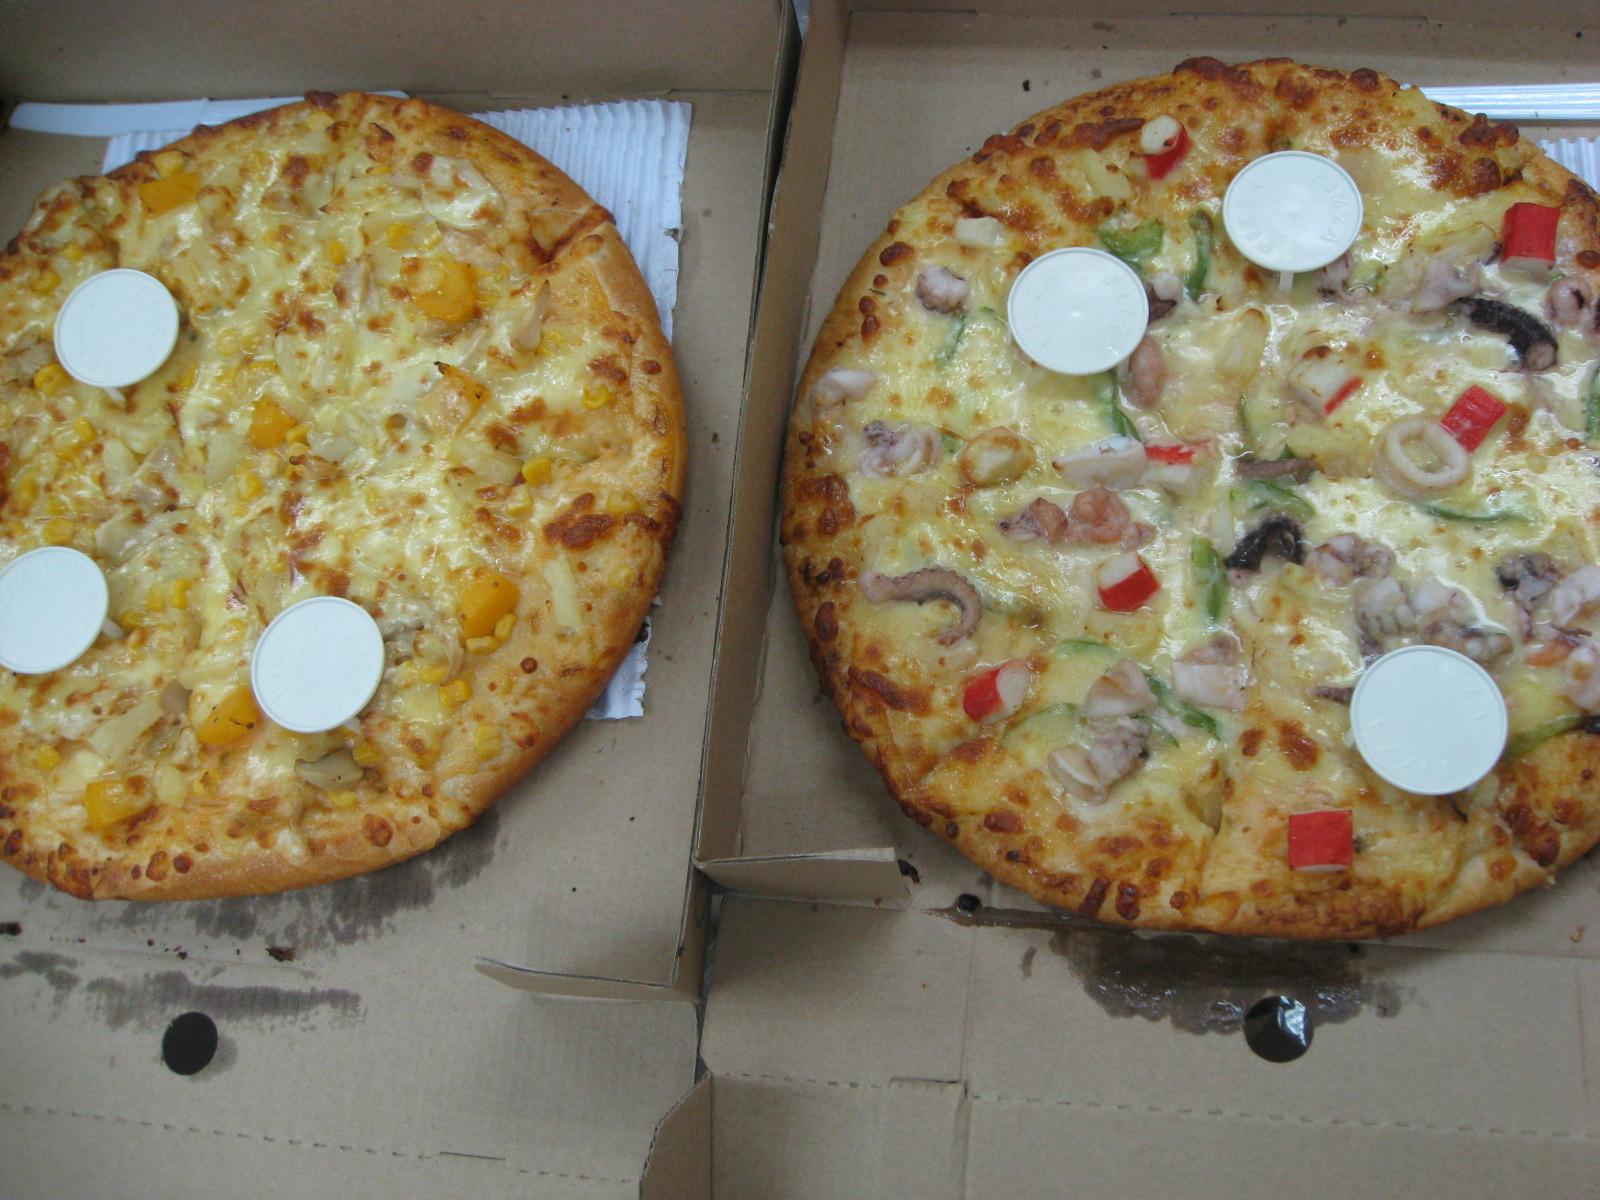 觀塘 – 芝脆雞 (cheese pizza) | meh